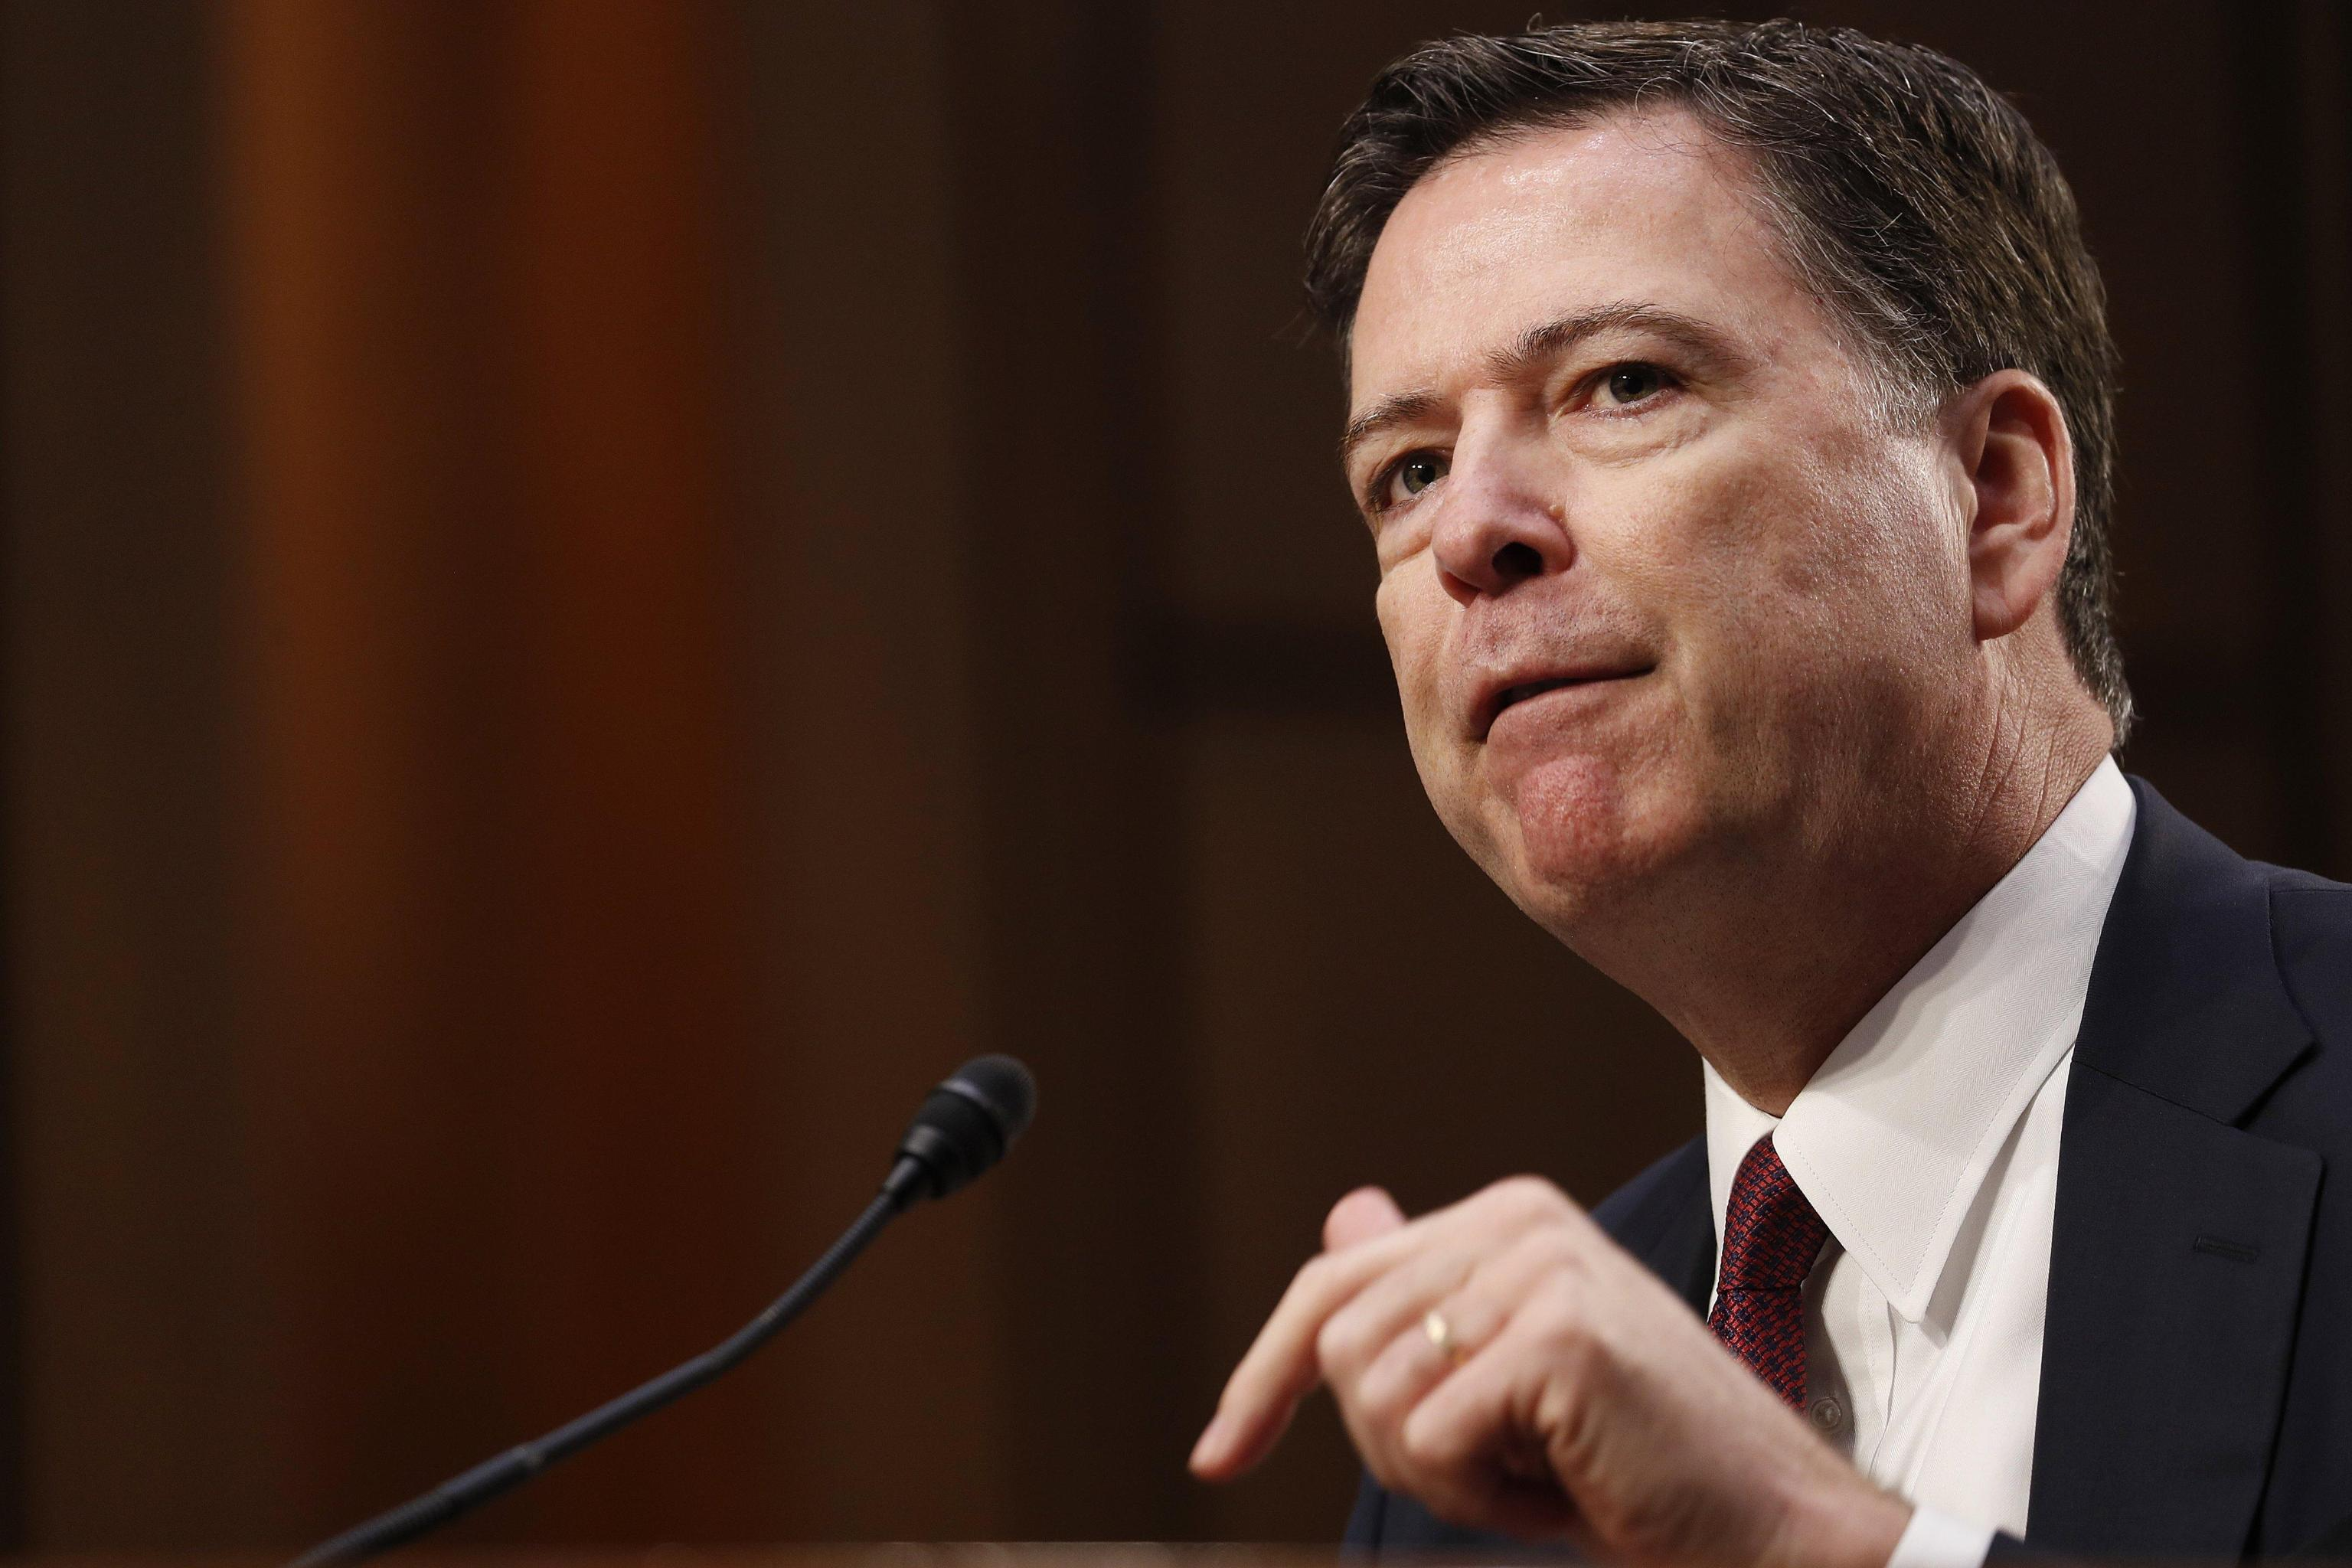 Usa: Comey, 'Fbi onesta e indipendente'